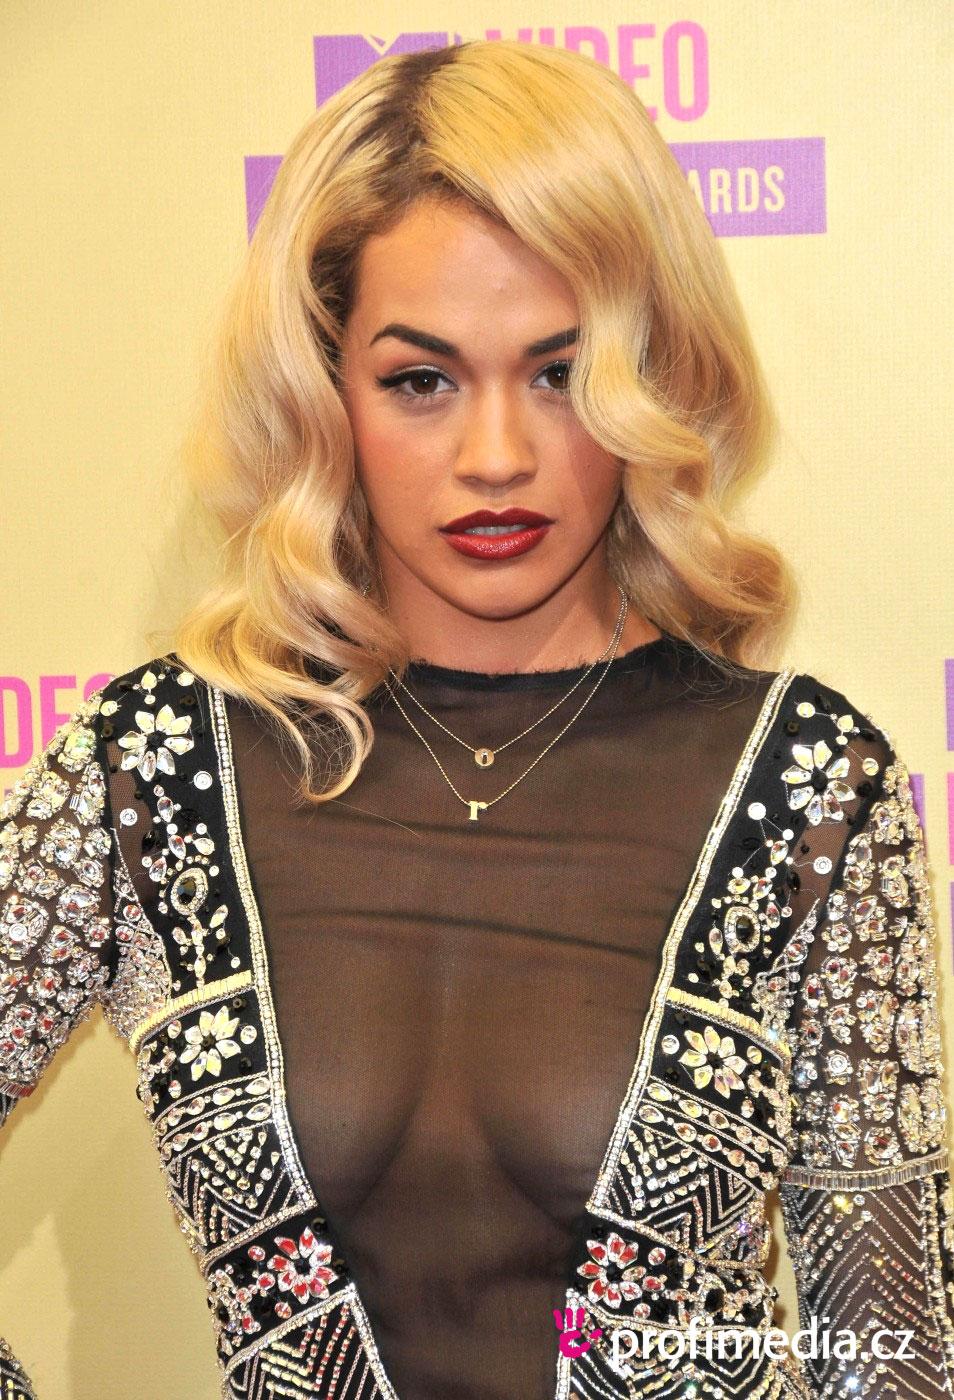 Rita Ora Hairstyle Easyhairstyler